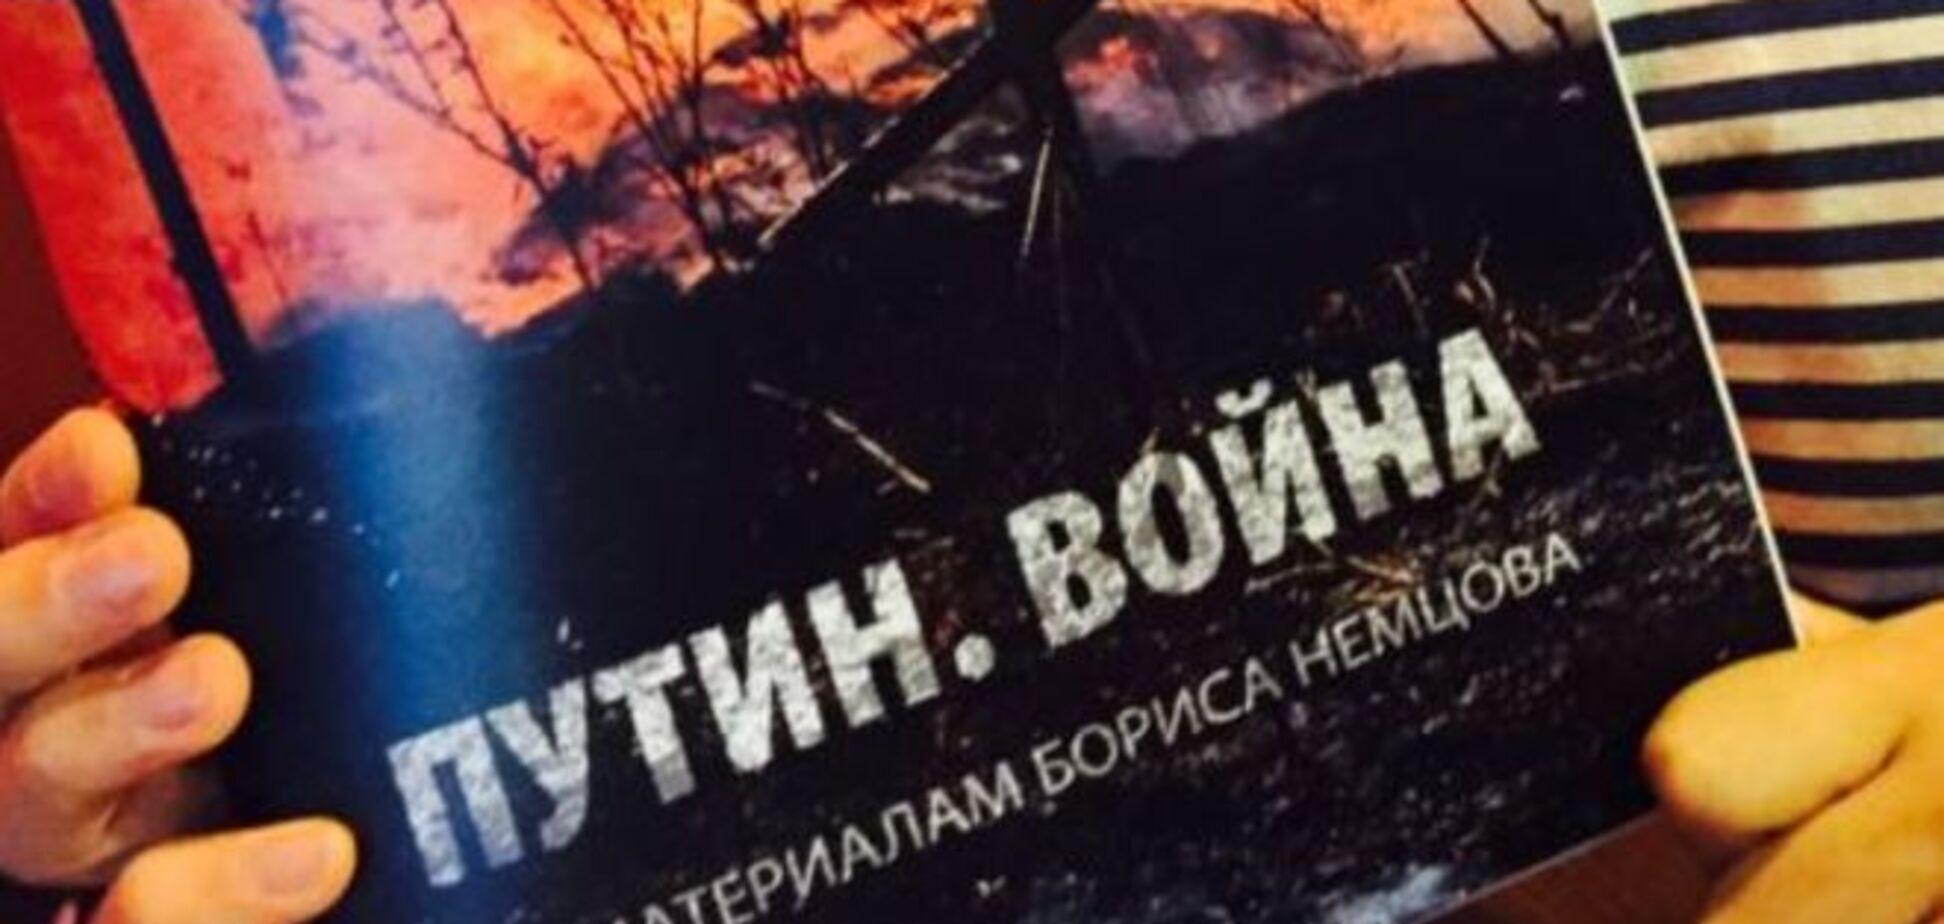 Презентация доклада Немцова о войне Путина в Украине: запись трансляции